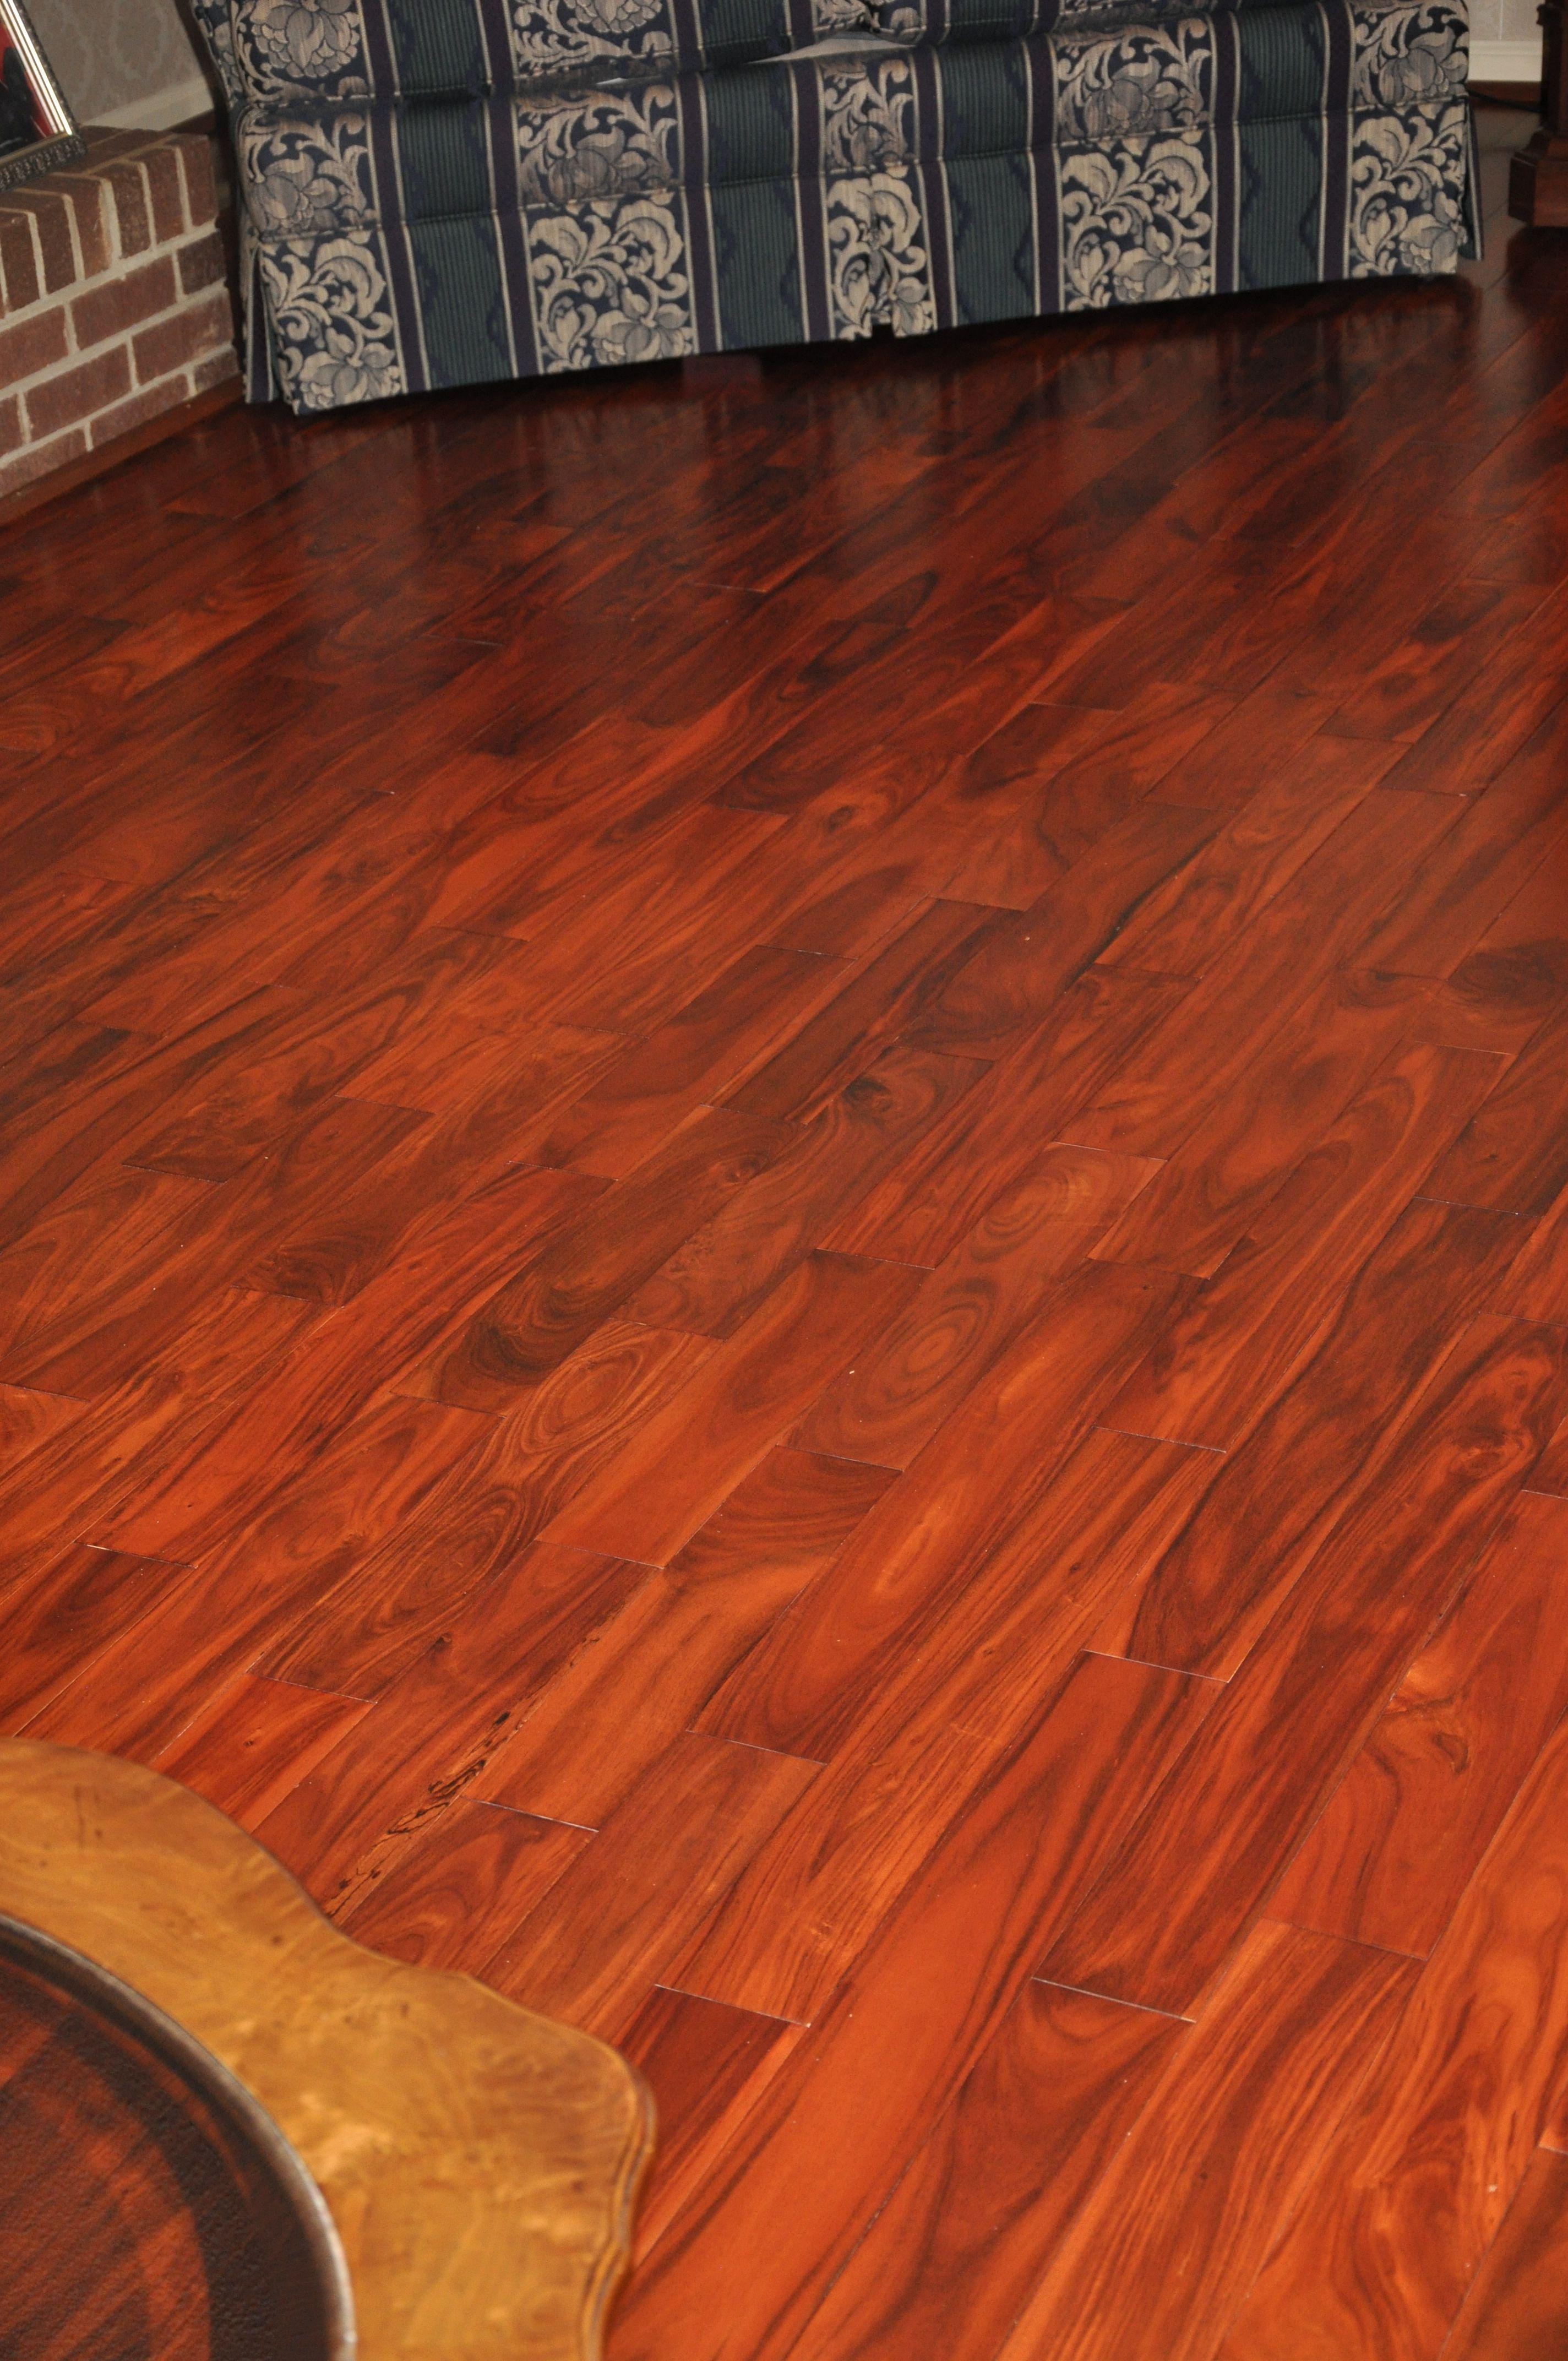 Prefinished Acacia Hardwood Flooring. A beautiful flooring